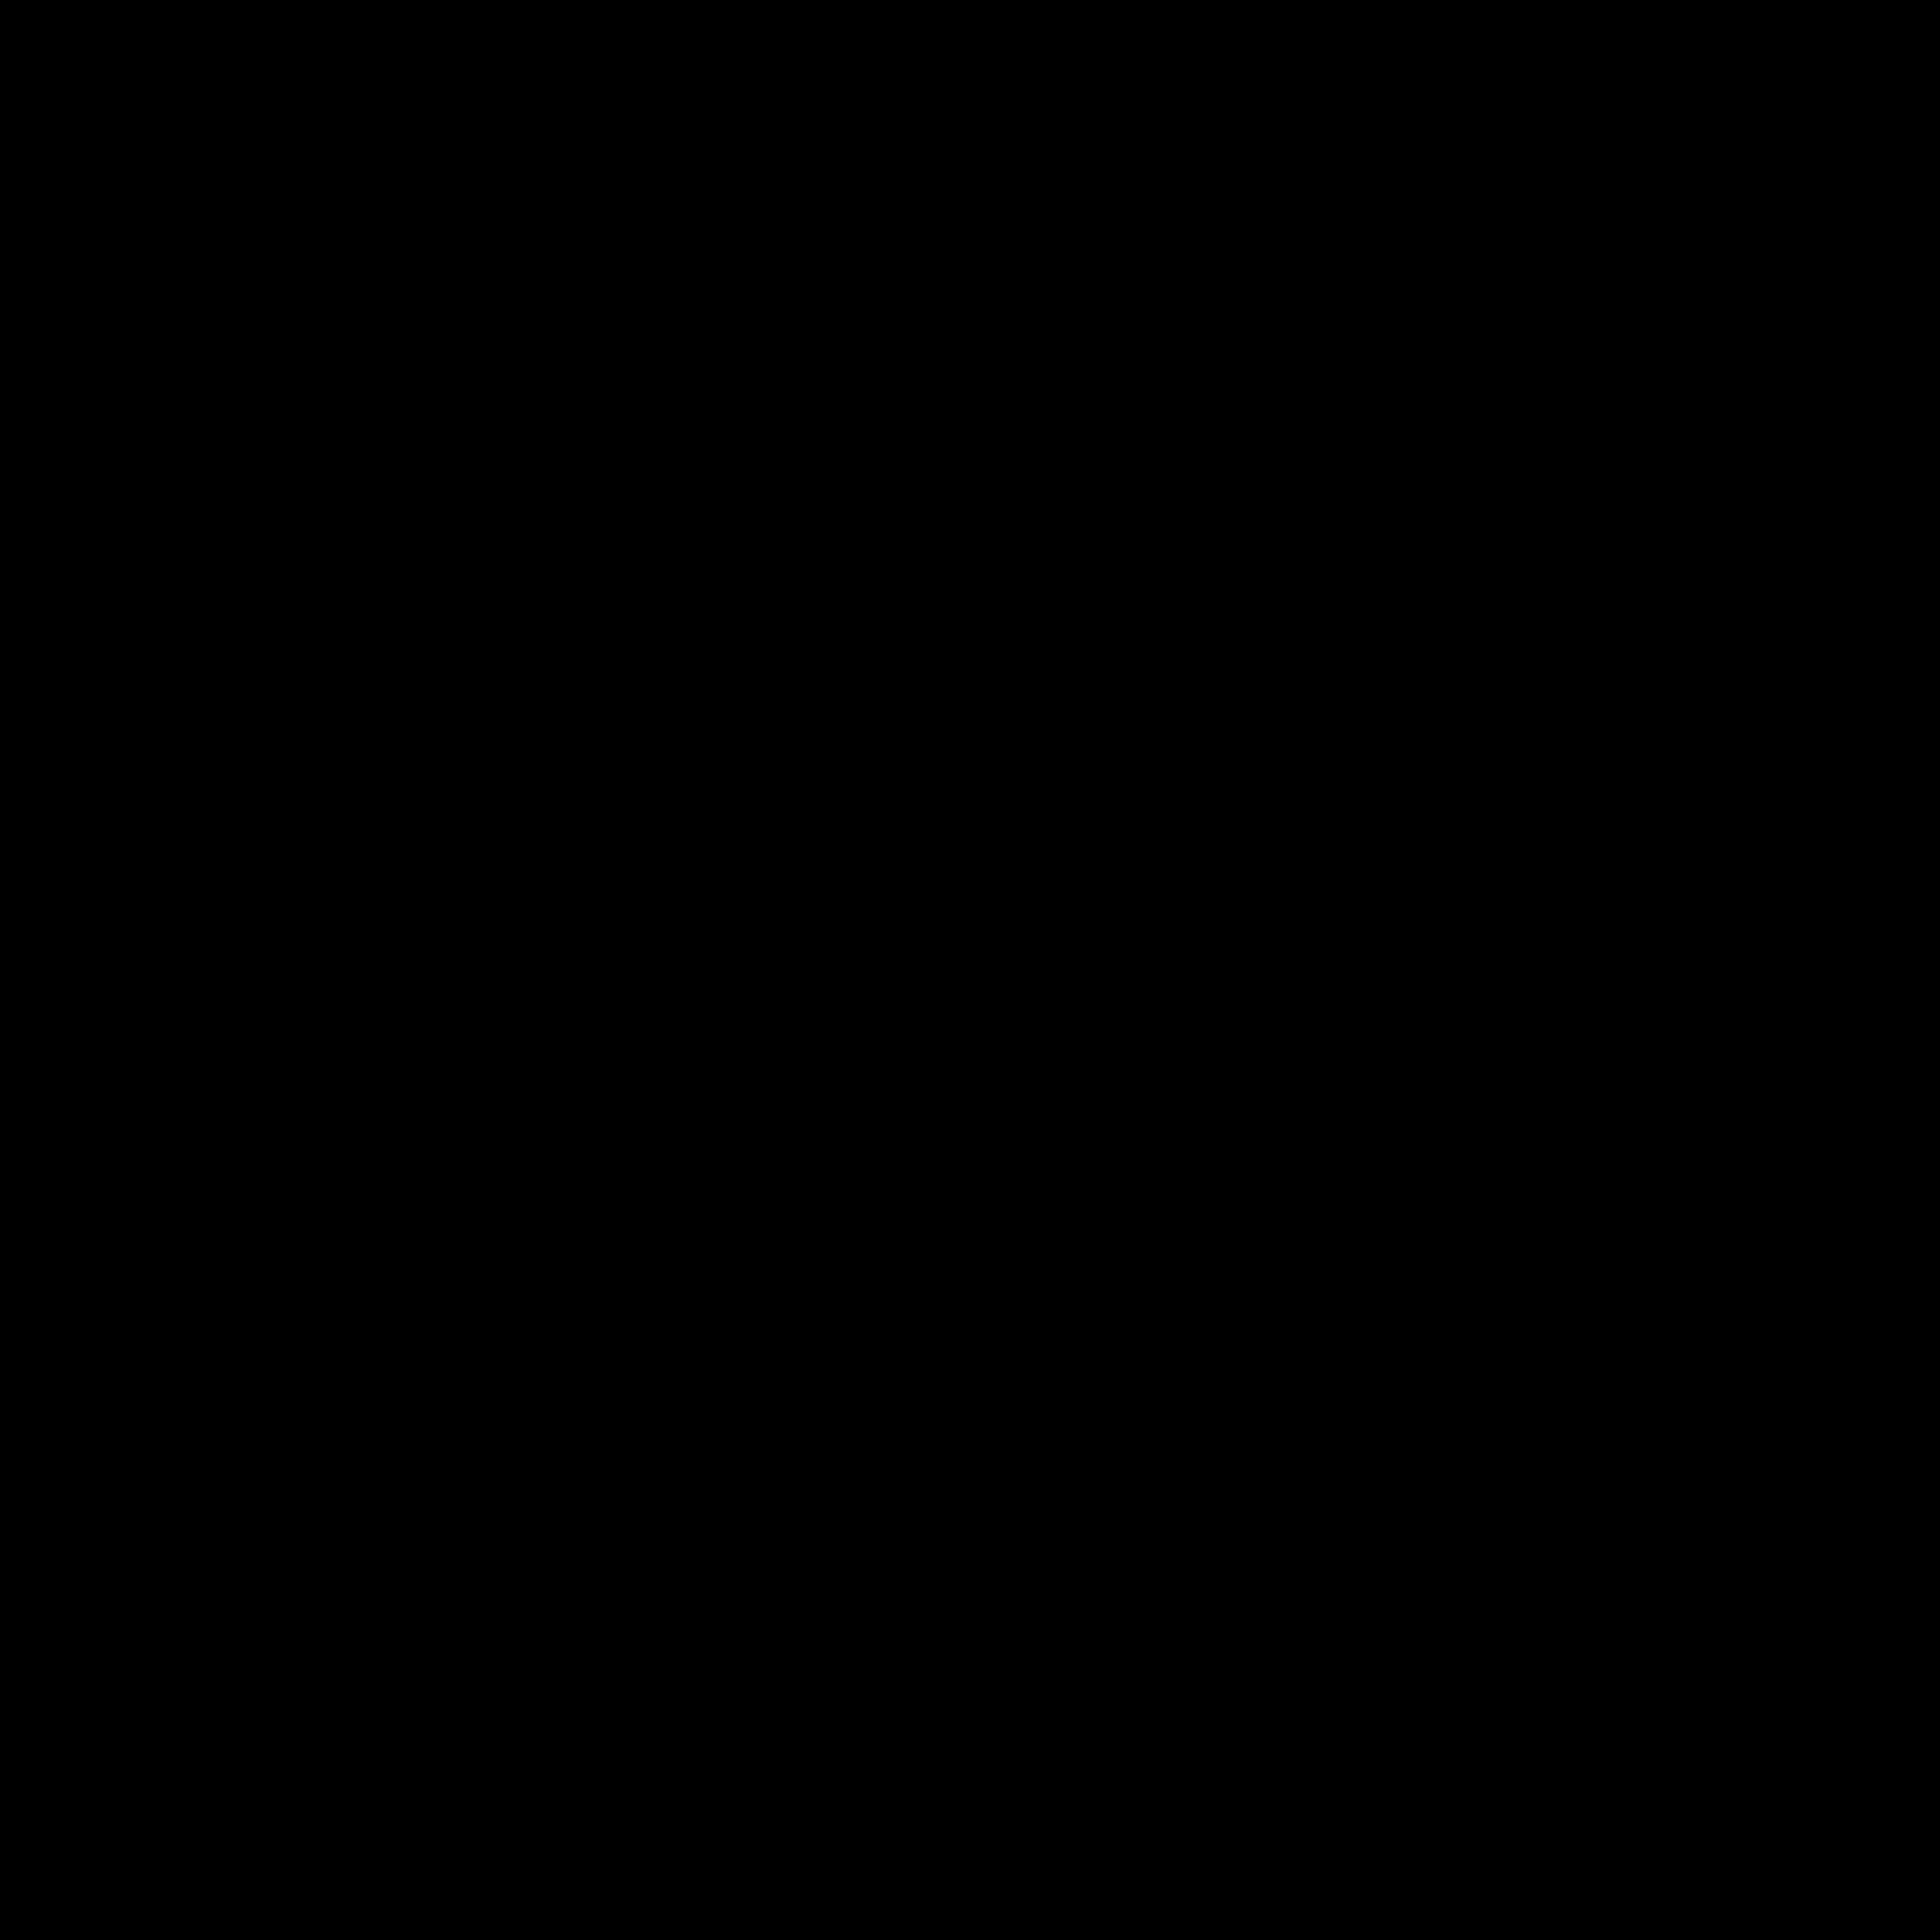 2000px-Biohazard_symbol